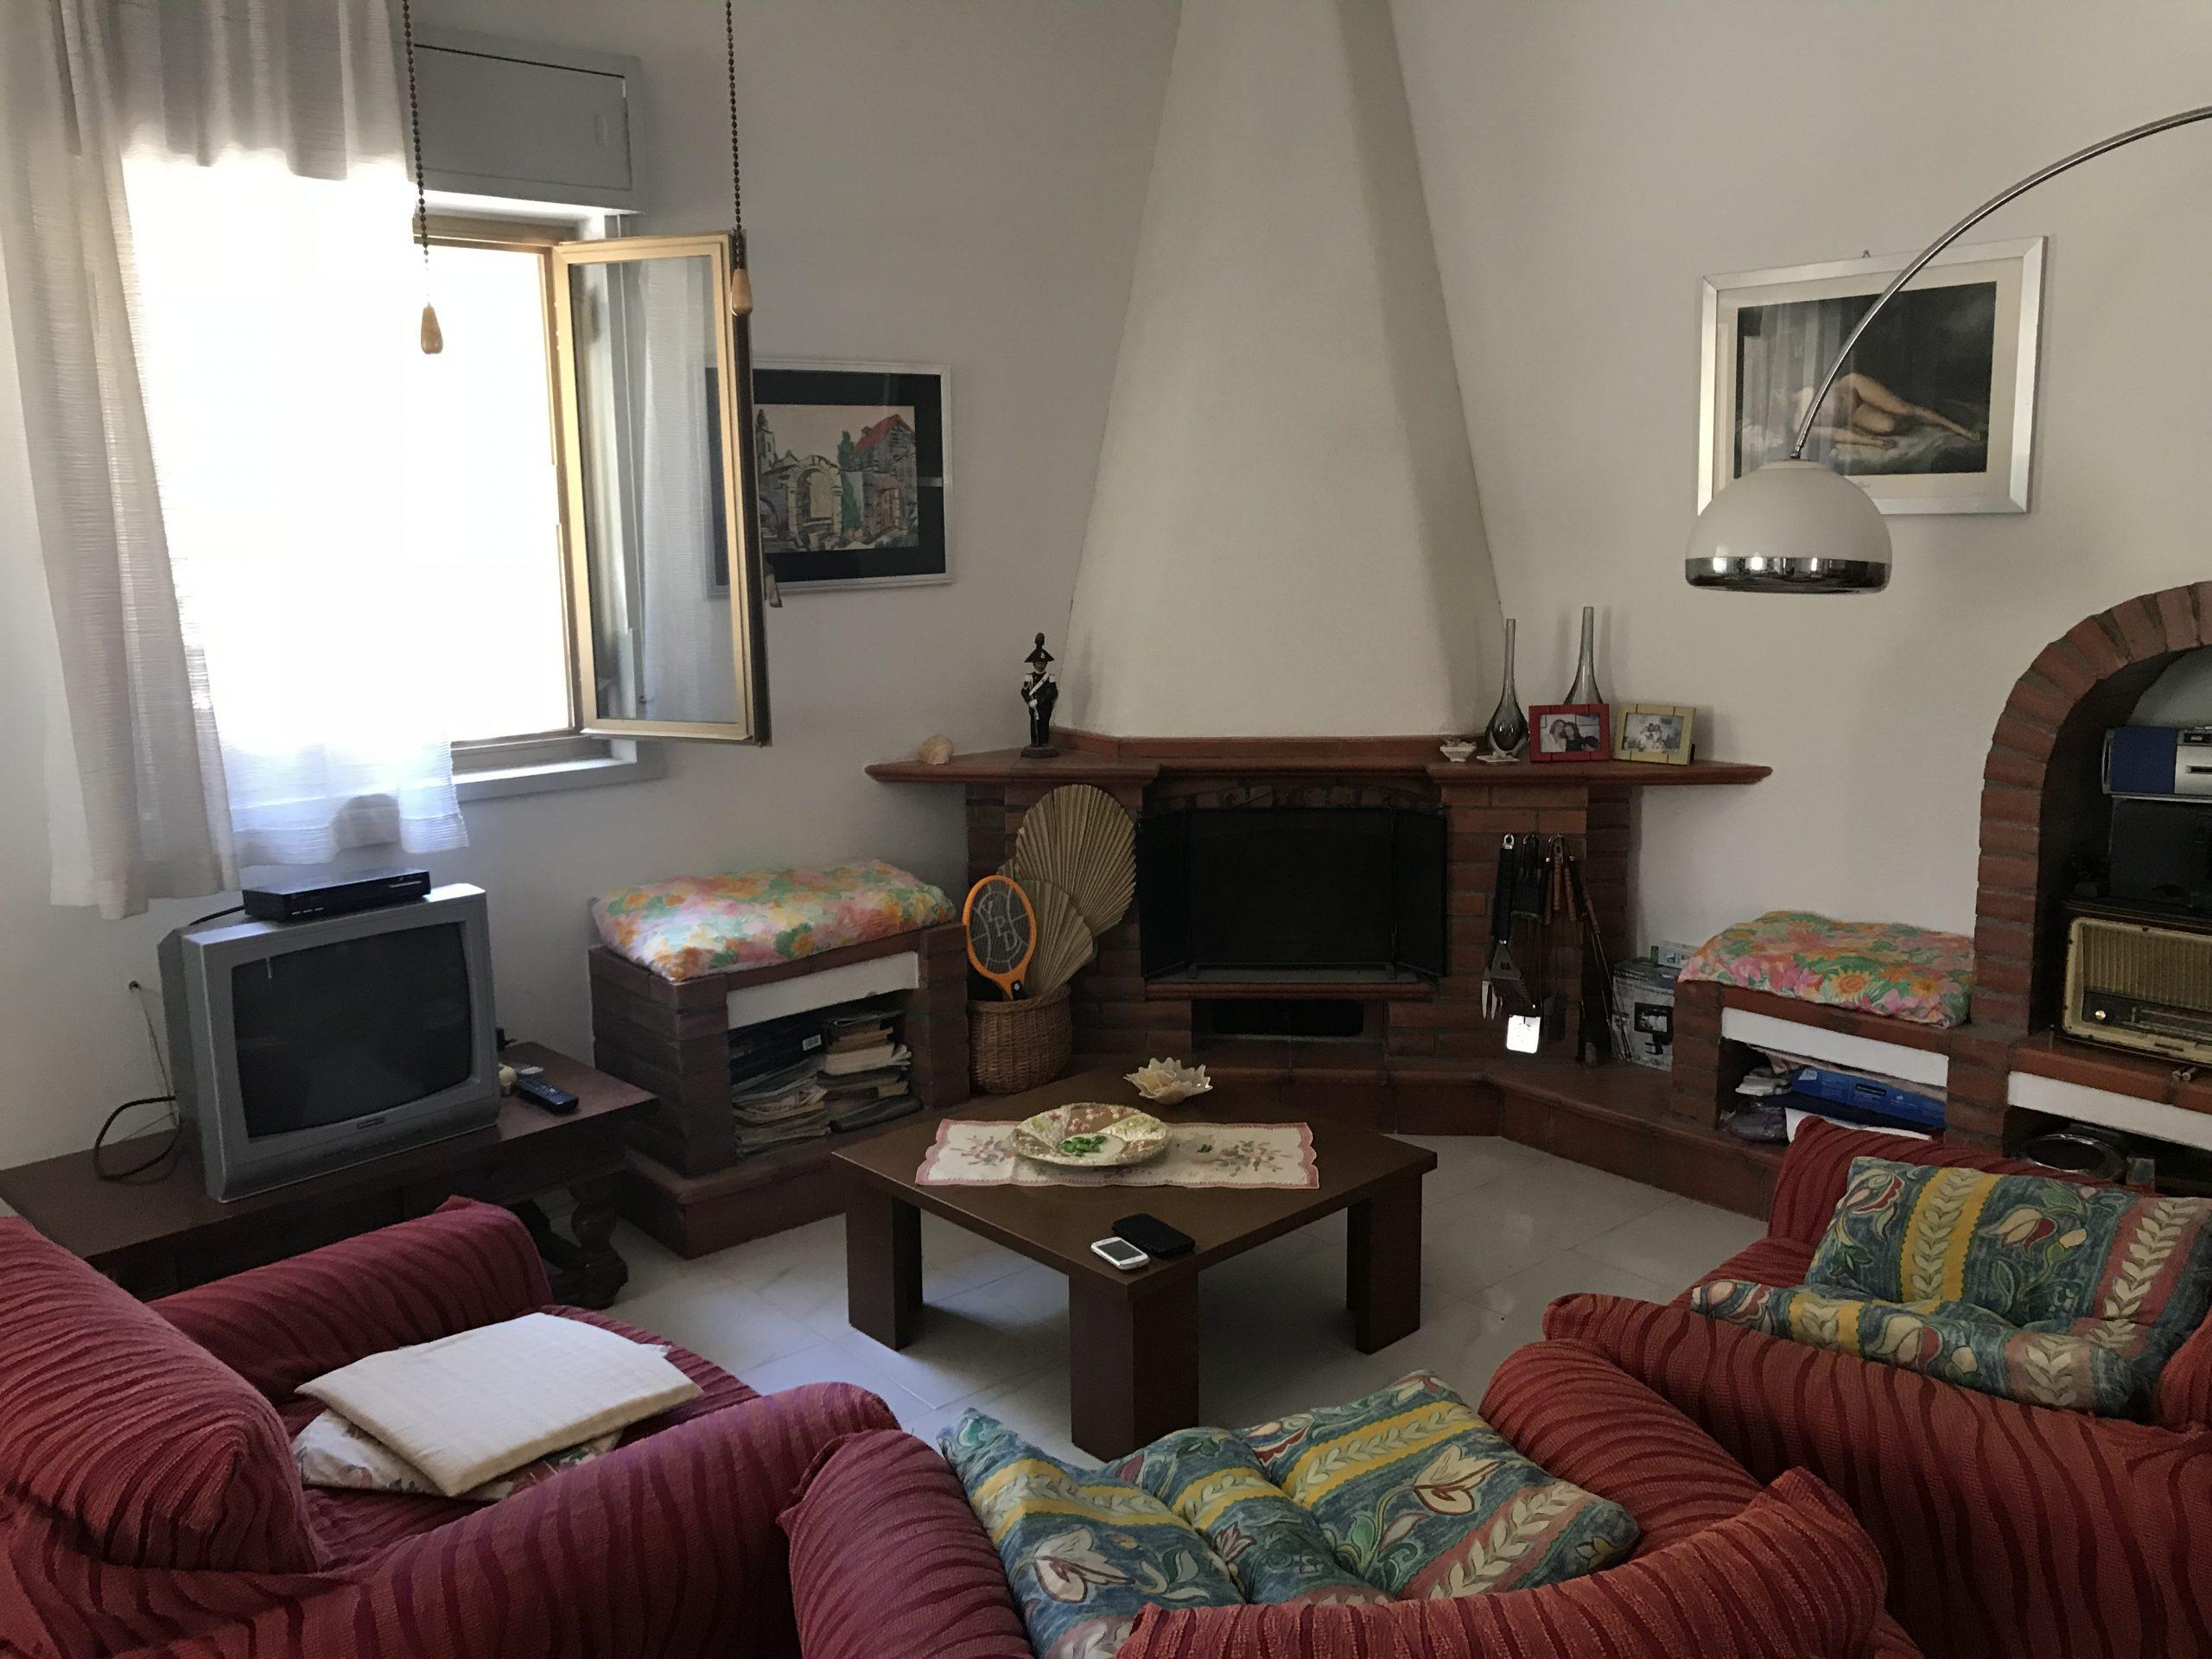 Casa in vendita in contrada lavanghe monserrato s.n.c., Licata